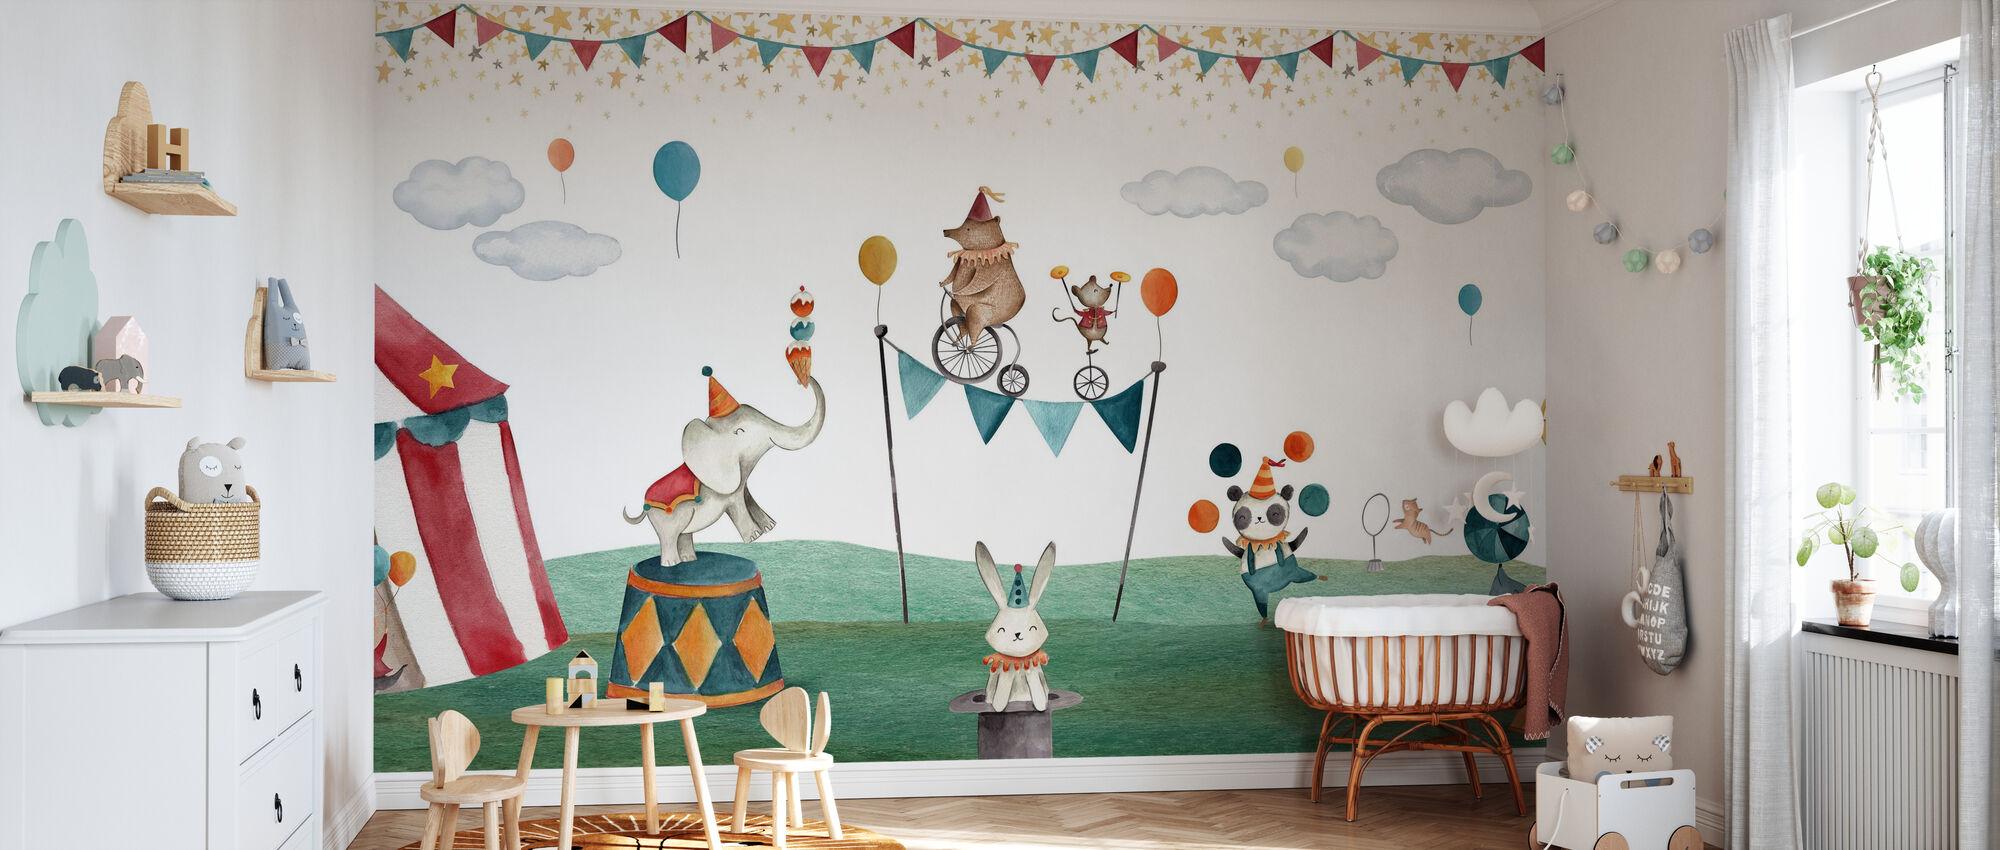 Crazy Circus - Behang - Babykamer